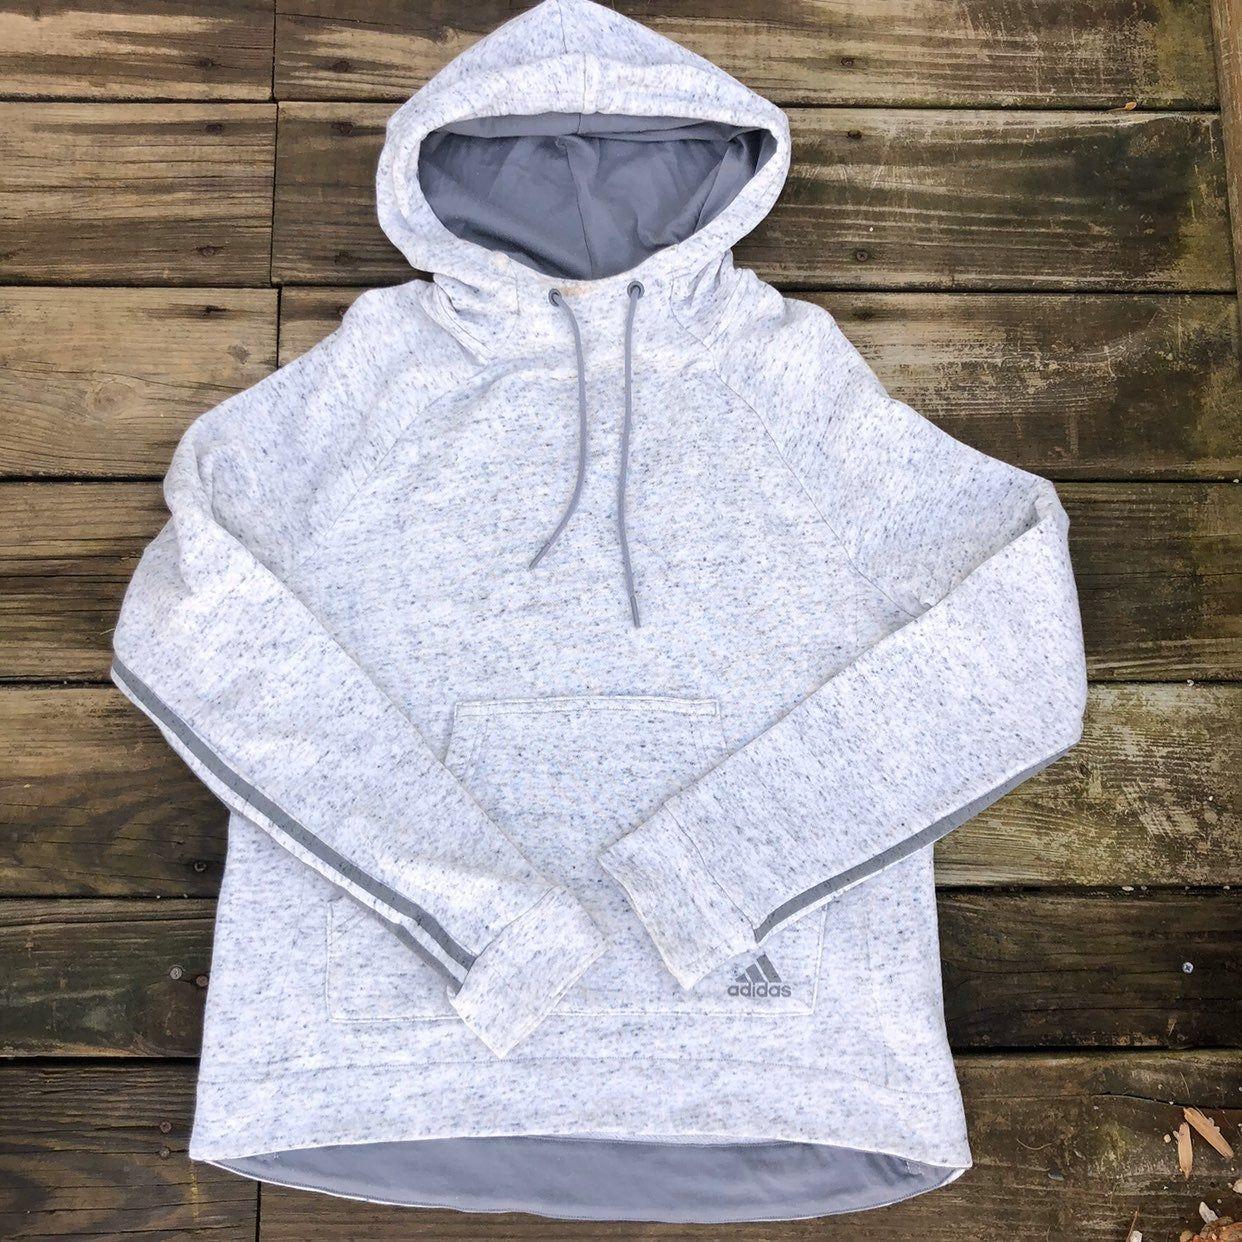 Adidas Cowl Neck Hoodie Sweatshirt Women S Medium Light Heathered Gray Color Good Used Condition Slight Spot On N Sweatshirts Women Hoodies Sweatshirts Hoodie [ 1242 x 1242 Pixel ]